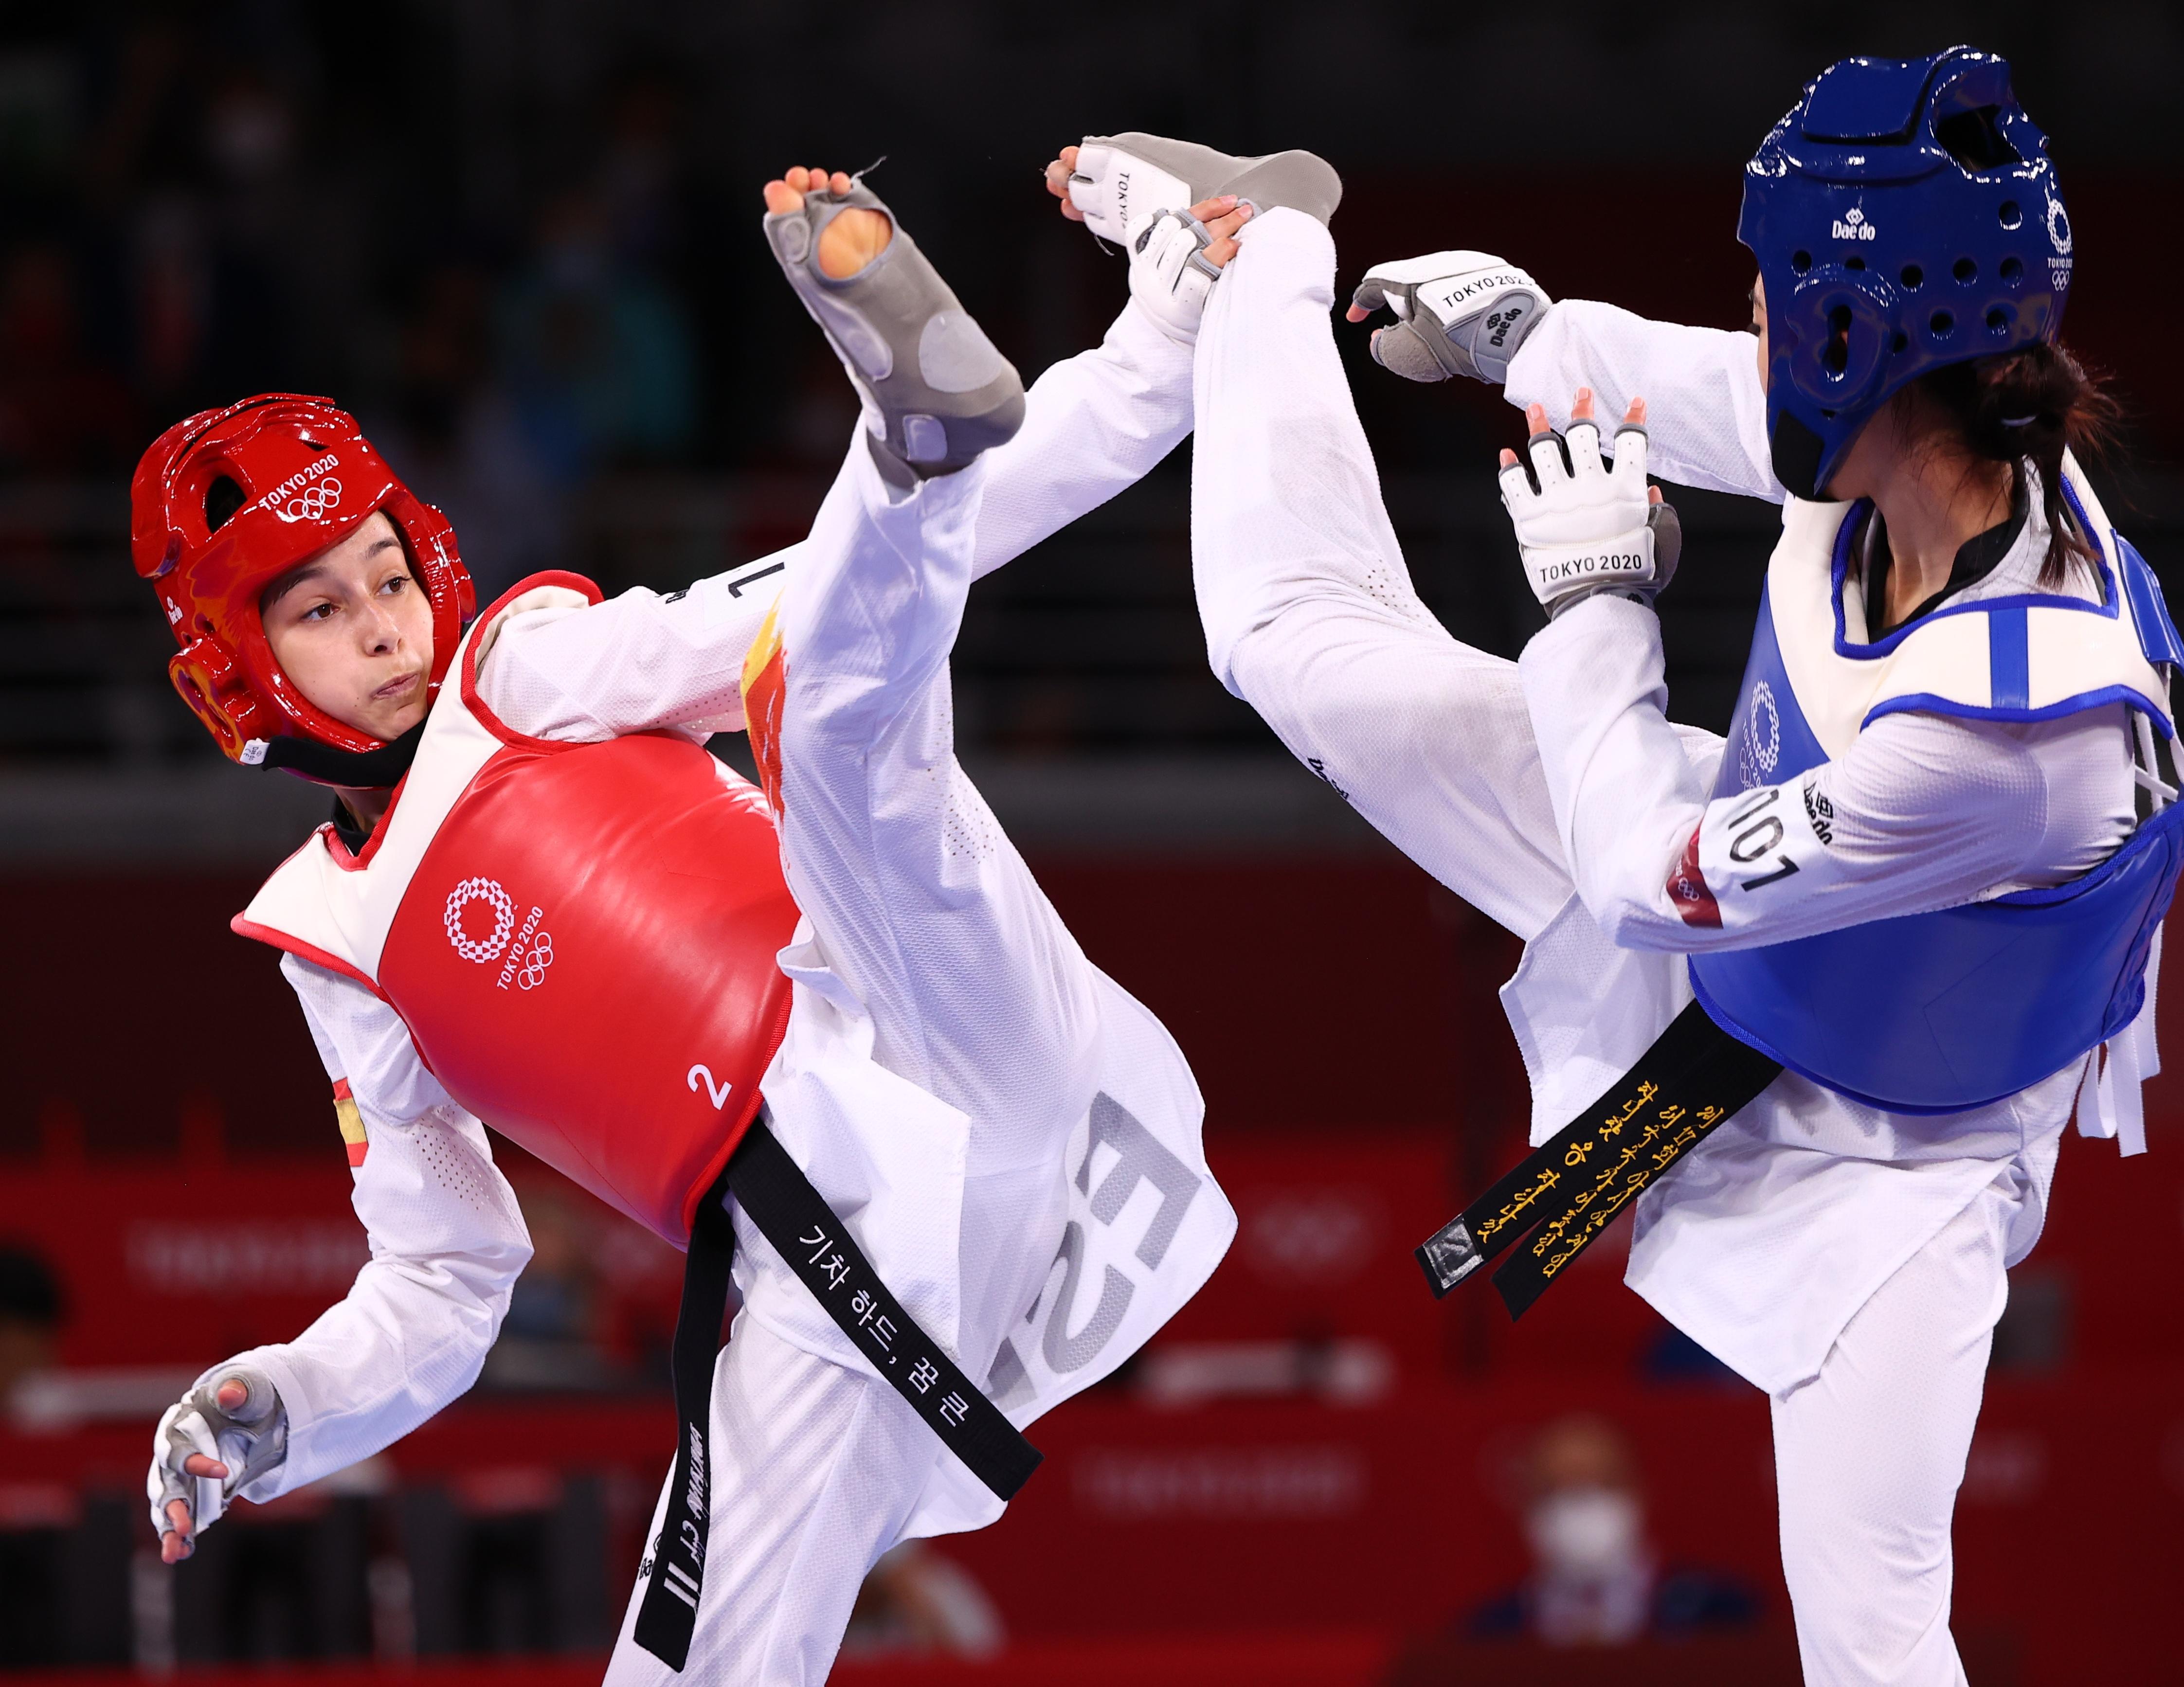 Tokyo 2020 Olympics - Taekwondo - Women's Flyweight - 49kg - Gold medal match - Makuhari Messe Hall A, Chiba, Japan - July 24, 2021. Adriana Cerezo Iglesias of Spain in action against Panipak Wongphatthanakit of Thailand REUTERS/Murad Sezer